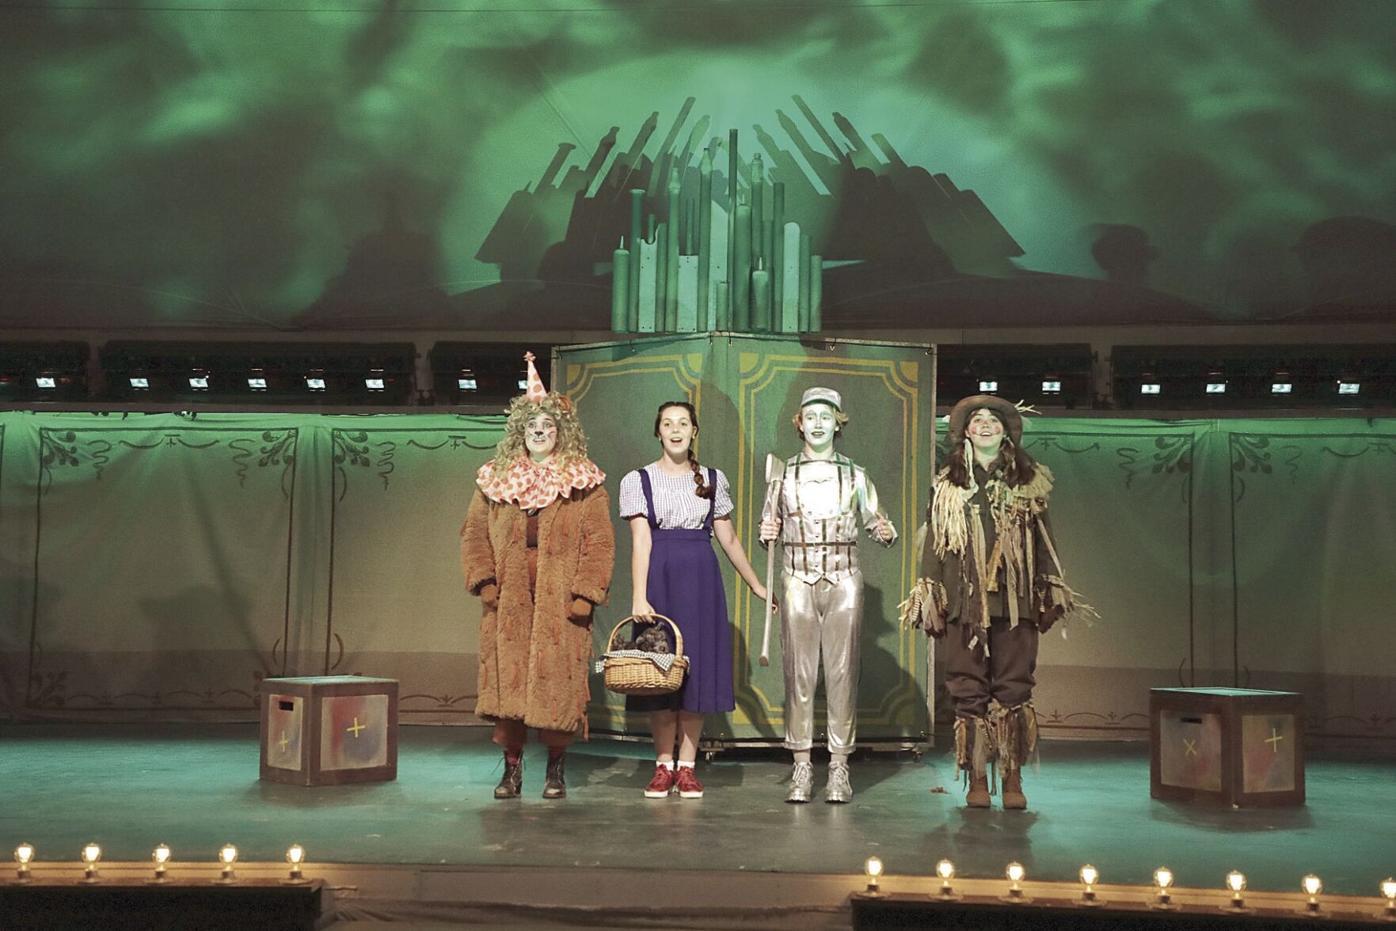 Cowardly Lion, Dorothy, Tin Man, and Scarecrow